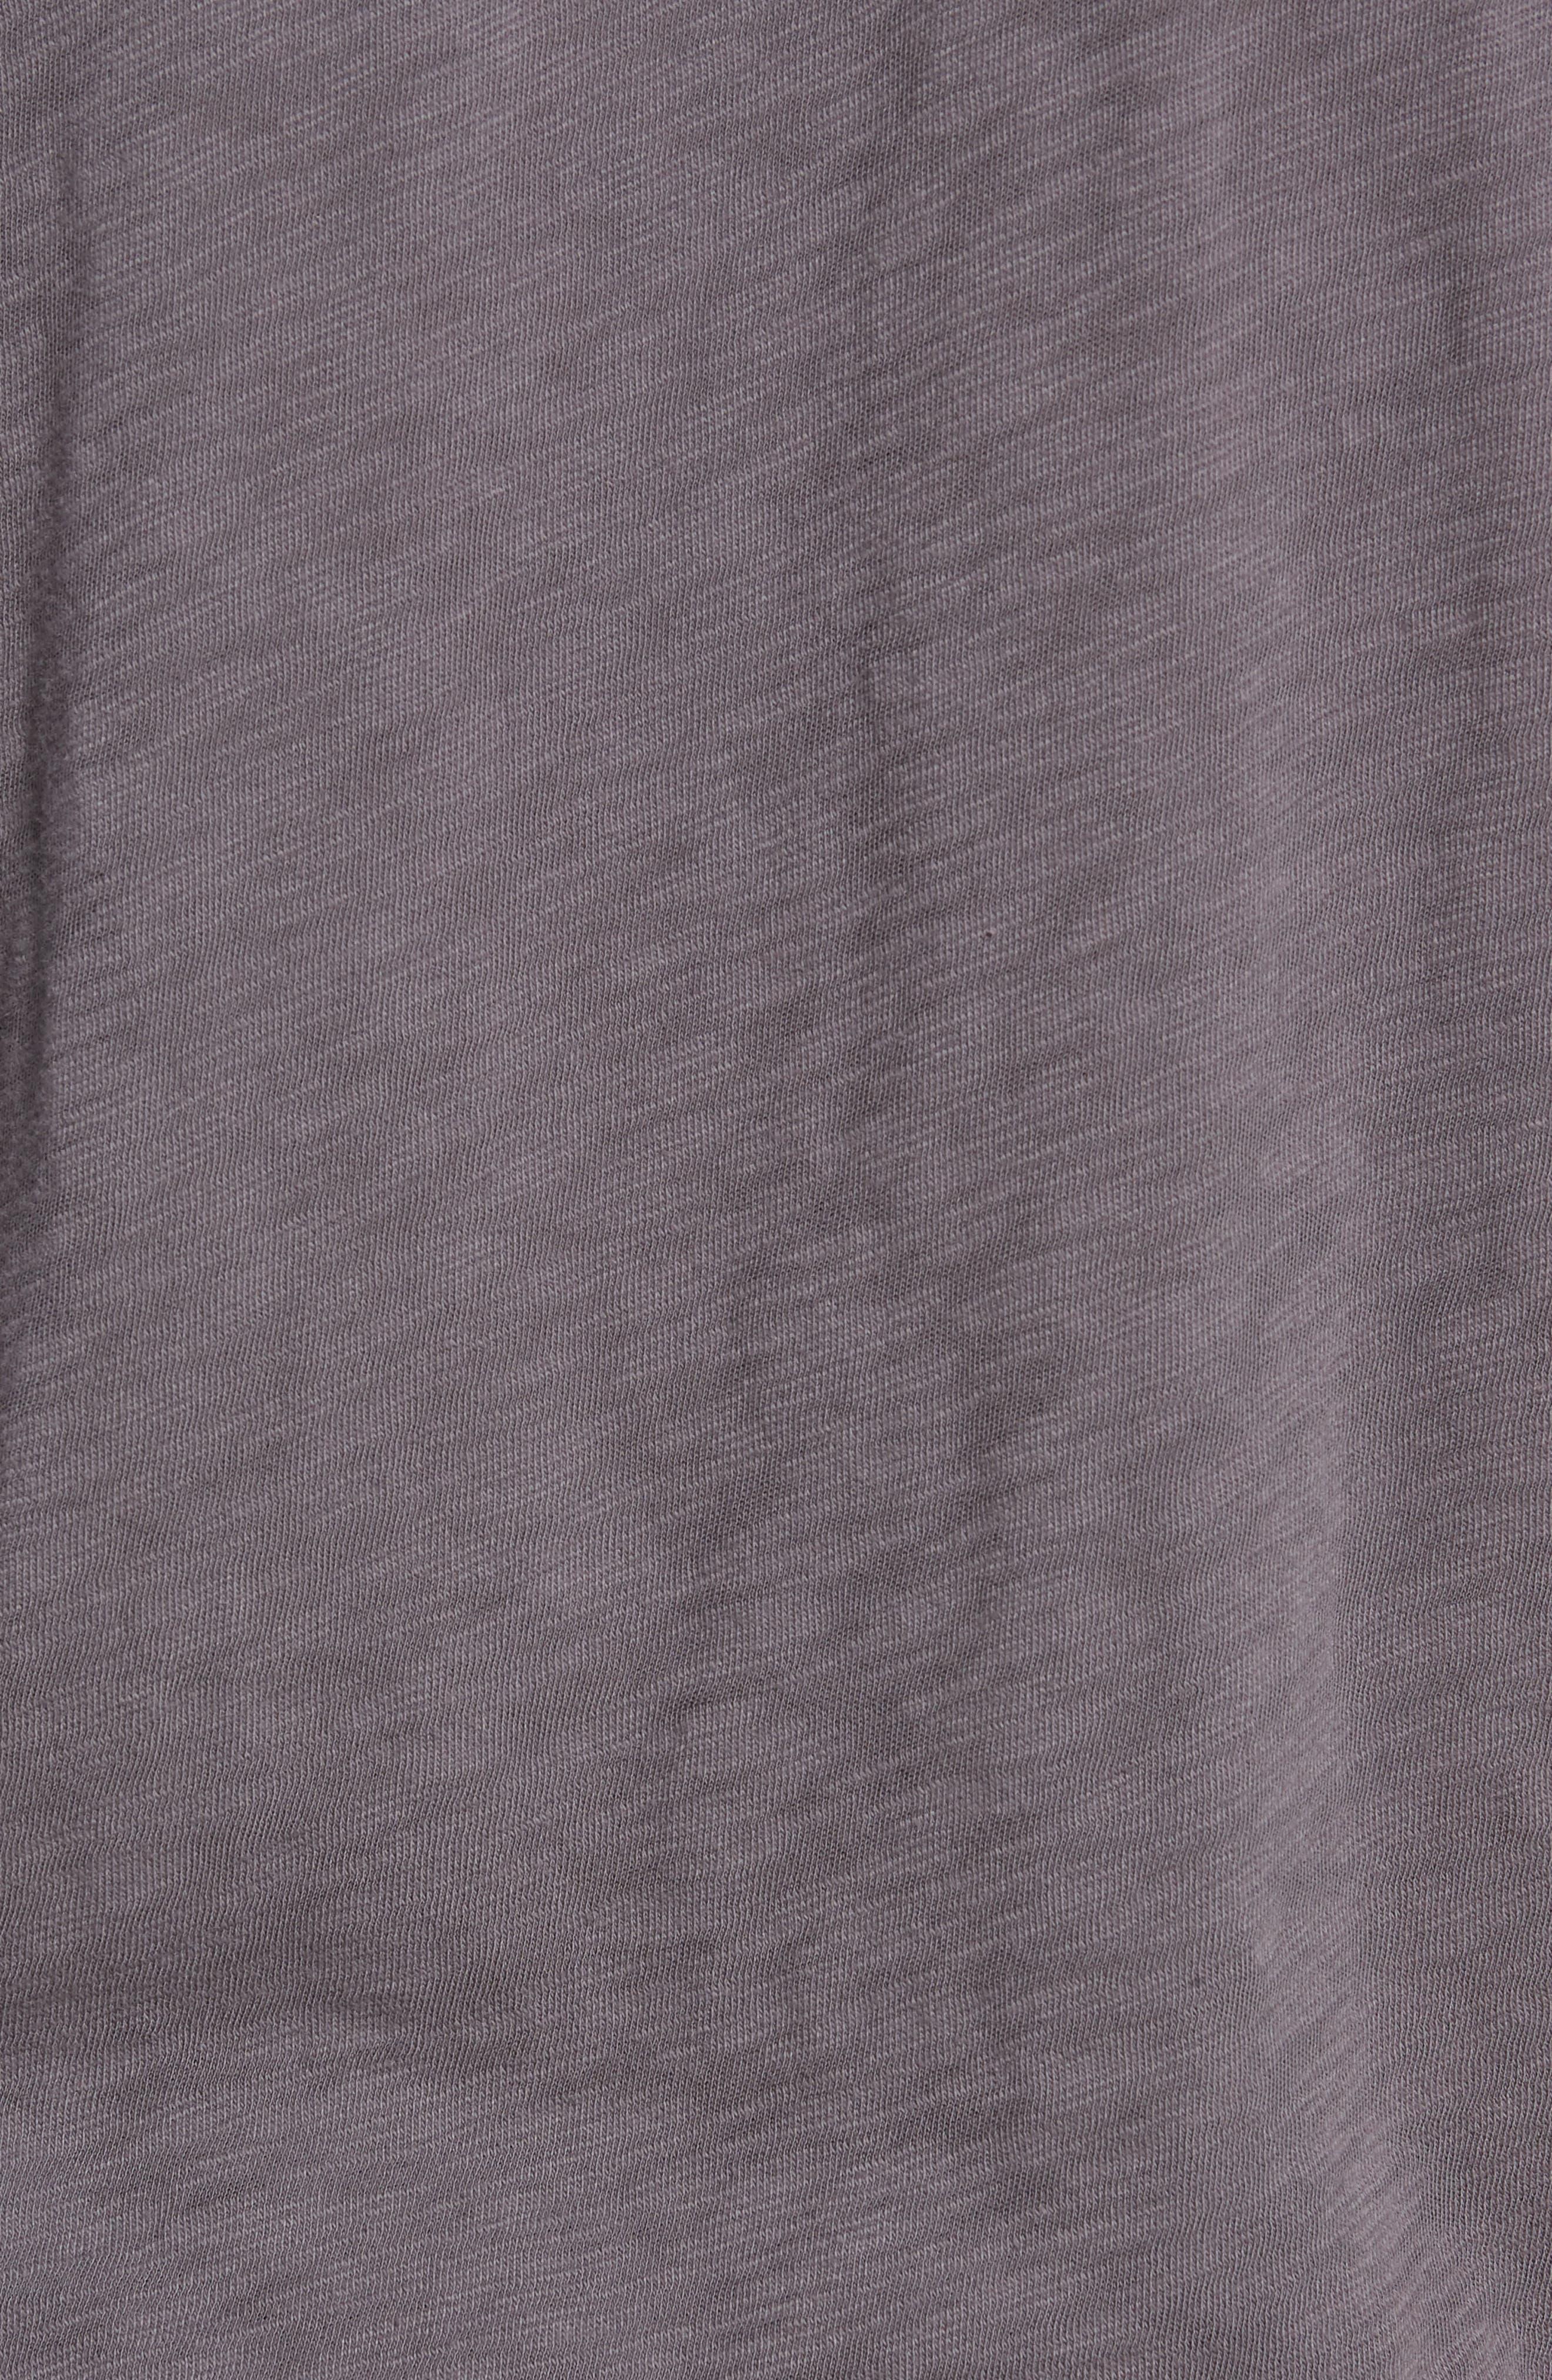 Crewneck T-Shirt,                             Alternate thumbnail 5, color,                             CHARCOAL